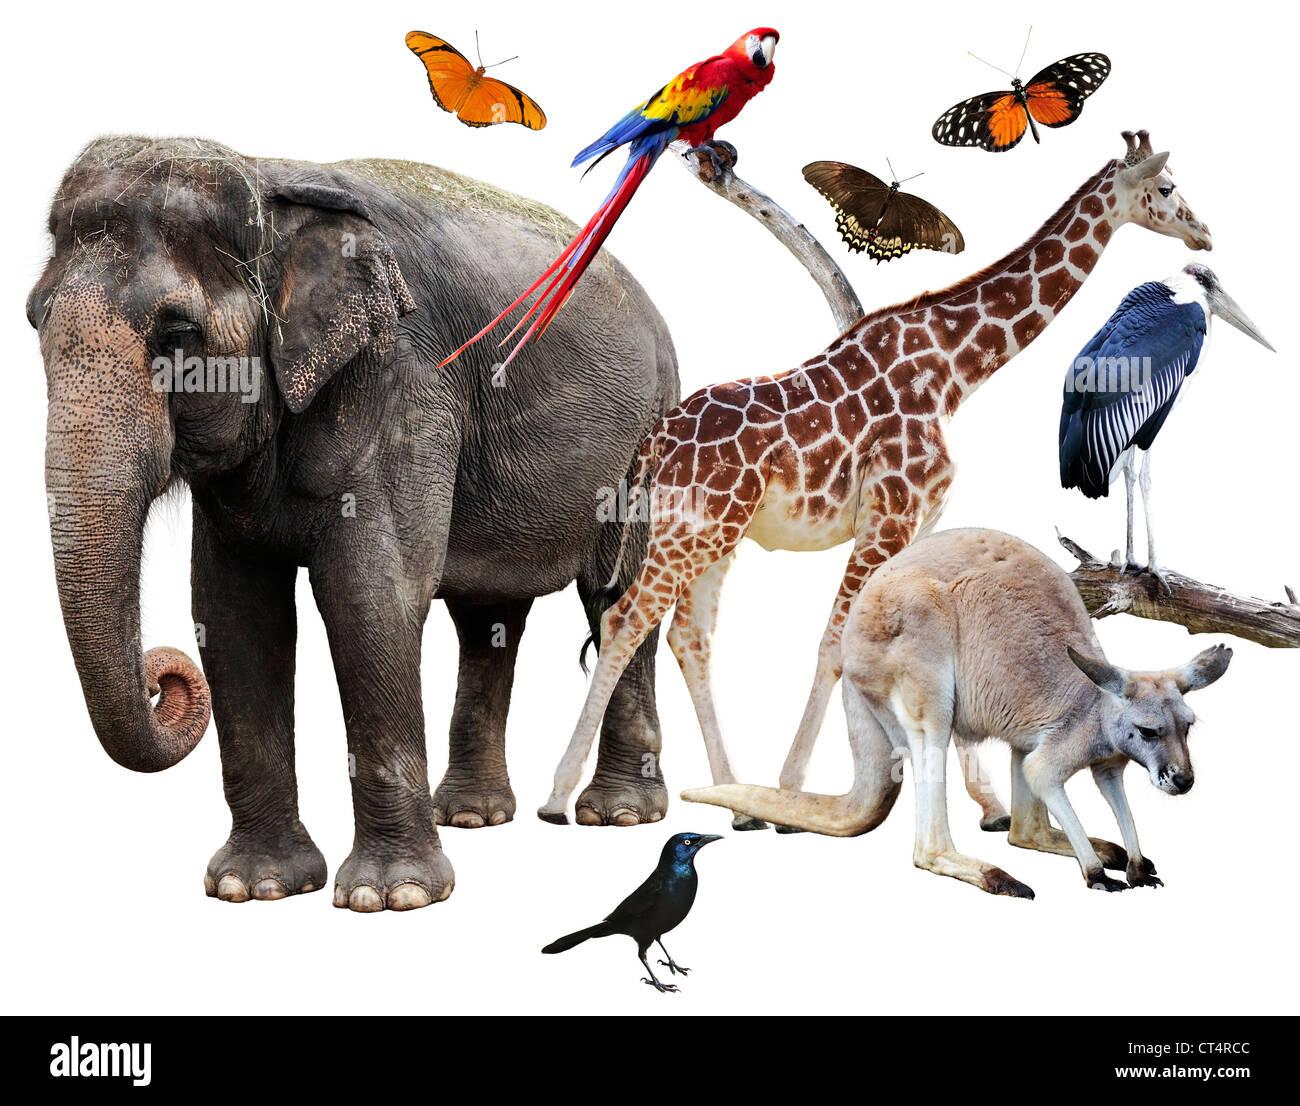 elephant bird stockfotos elephant bird bilder alamy. Black Bedroom Furniture Sets. Home Design Ideas